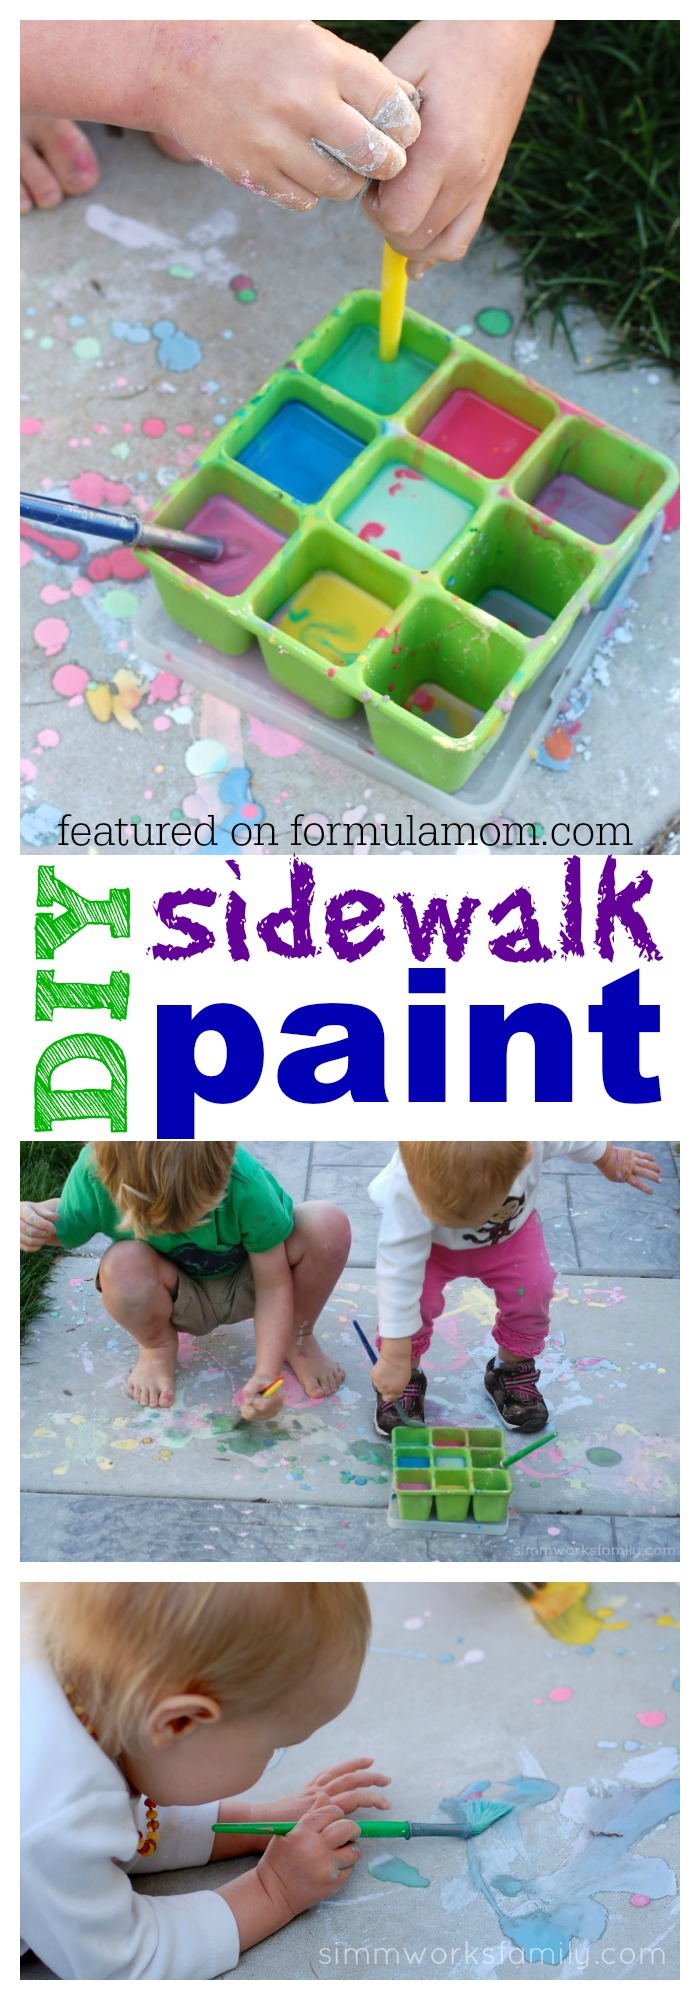 DIY Sidewalk Paint featured on Formula Mom